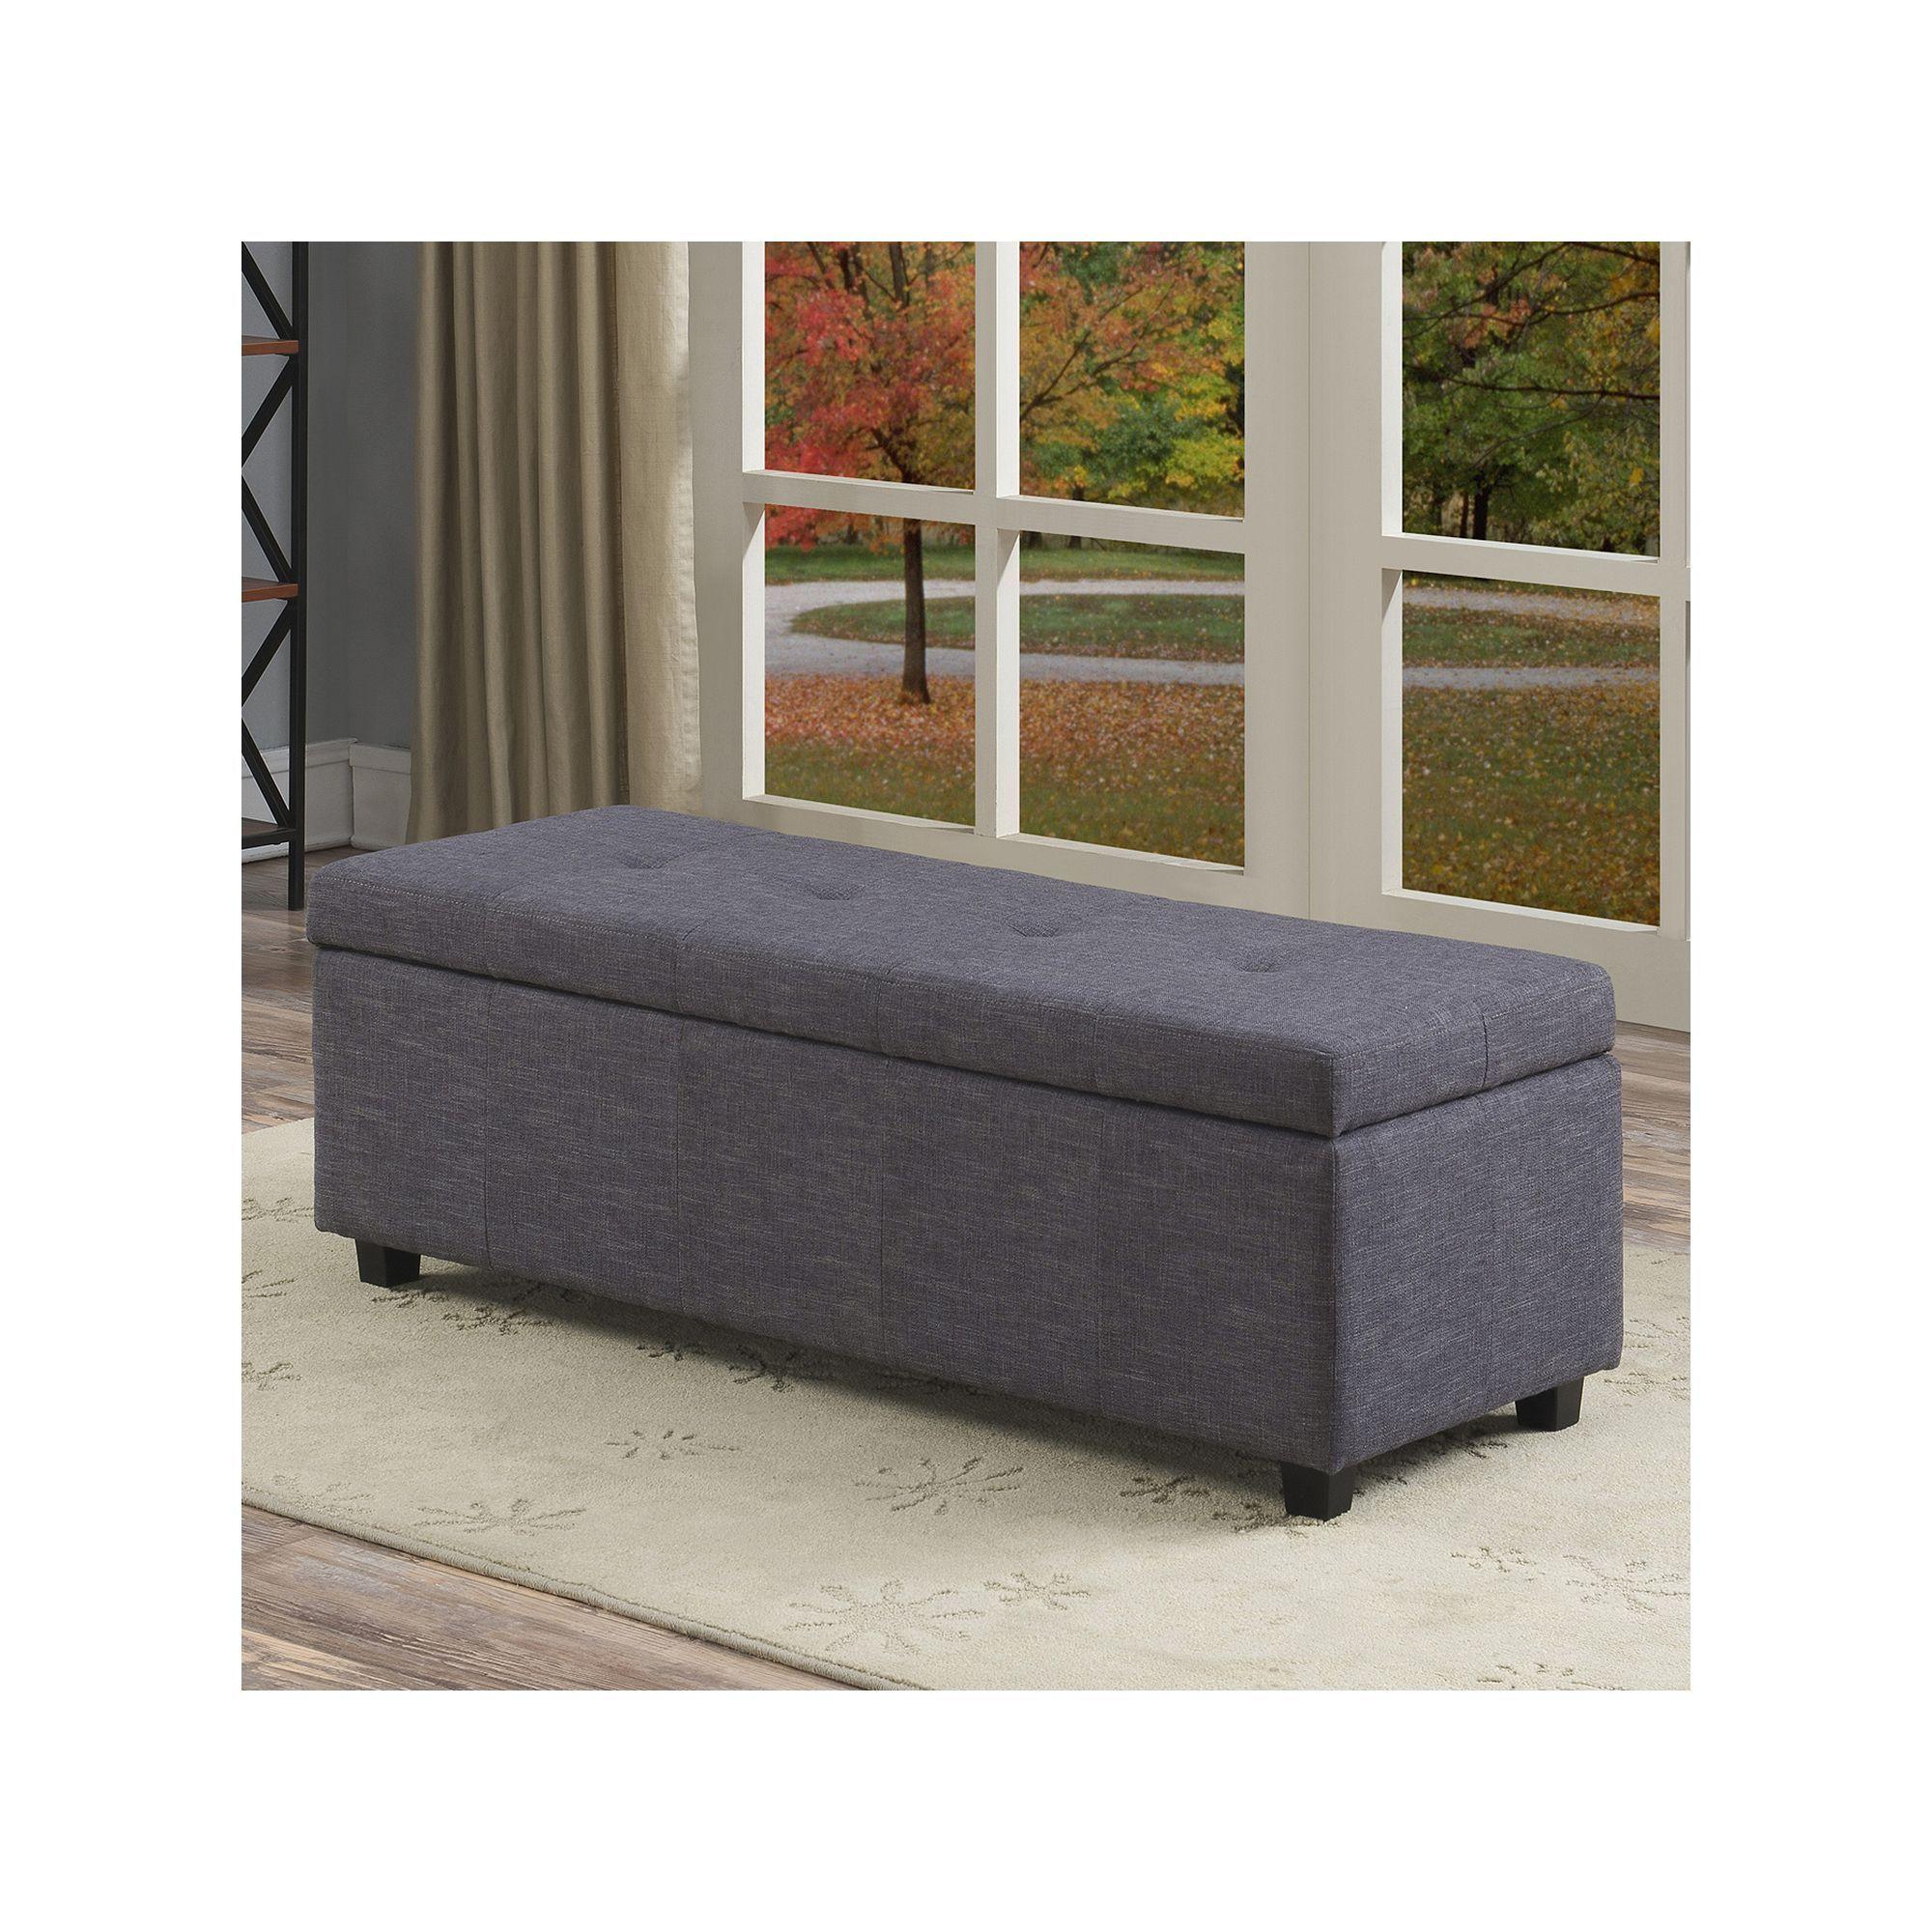 Groovy Simpli Home Castleford Large Rectangular Storage Ottoman Lamtechconsult Wood Chair Design Ideas Lamtechconsultcom